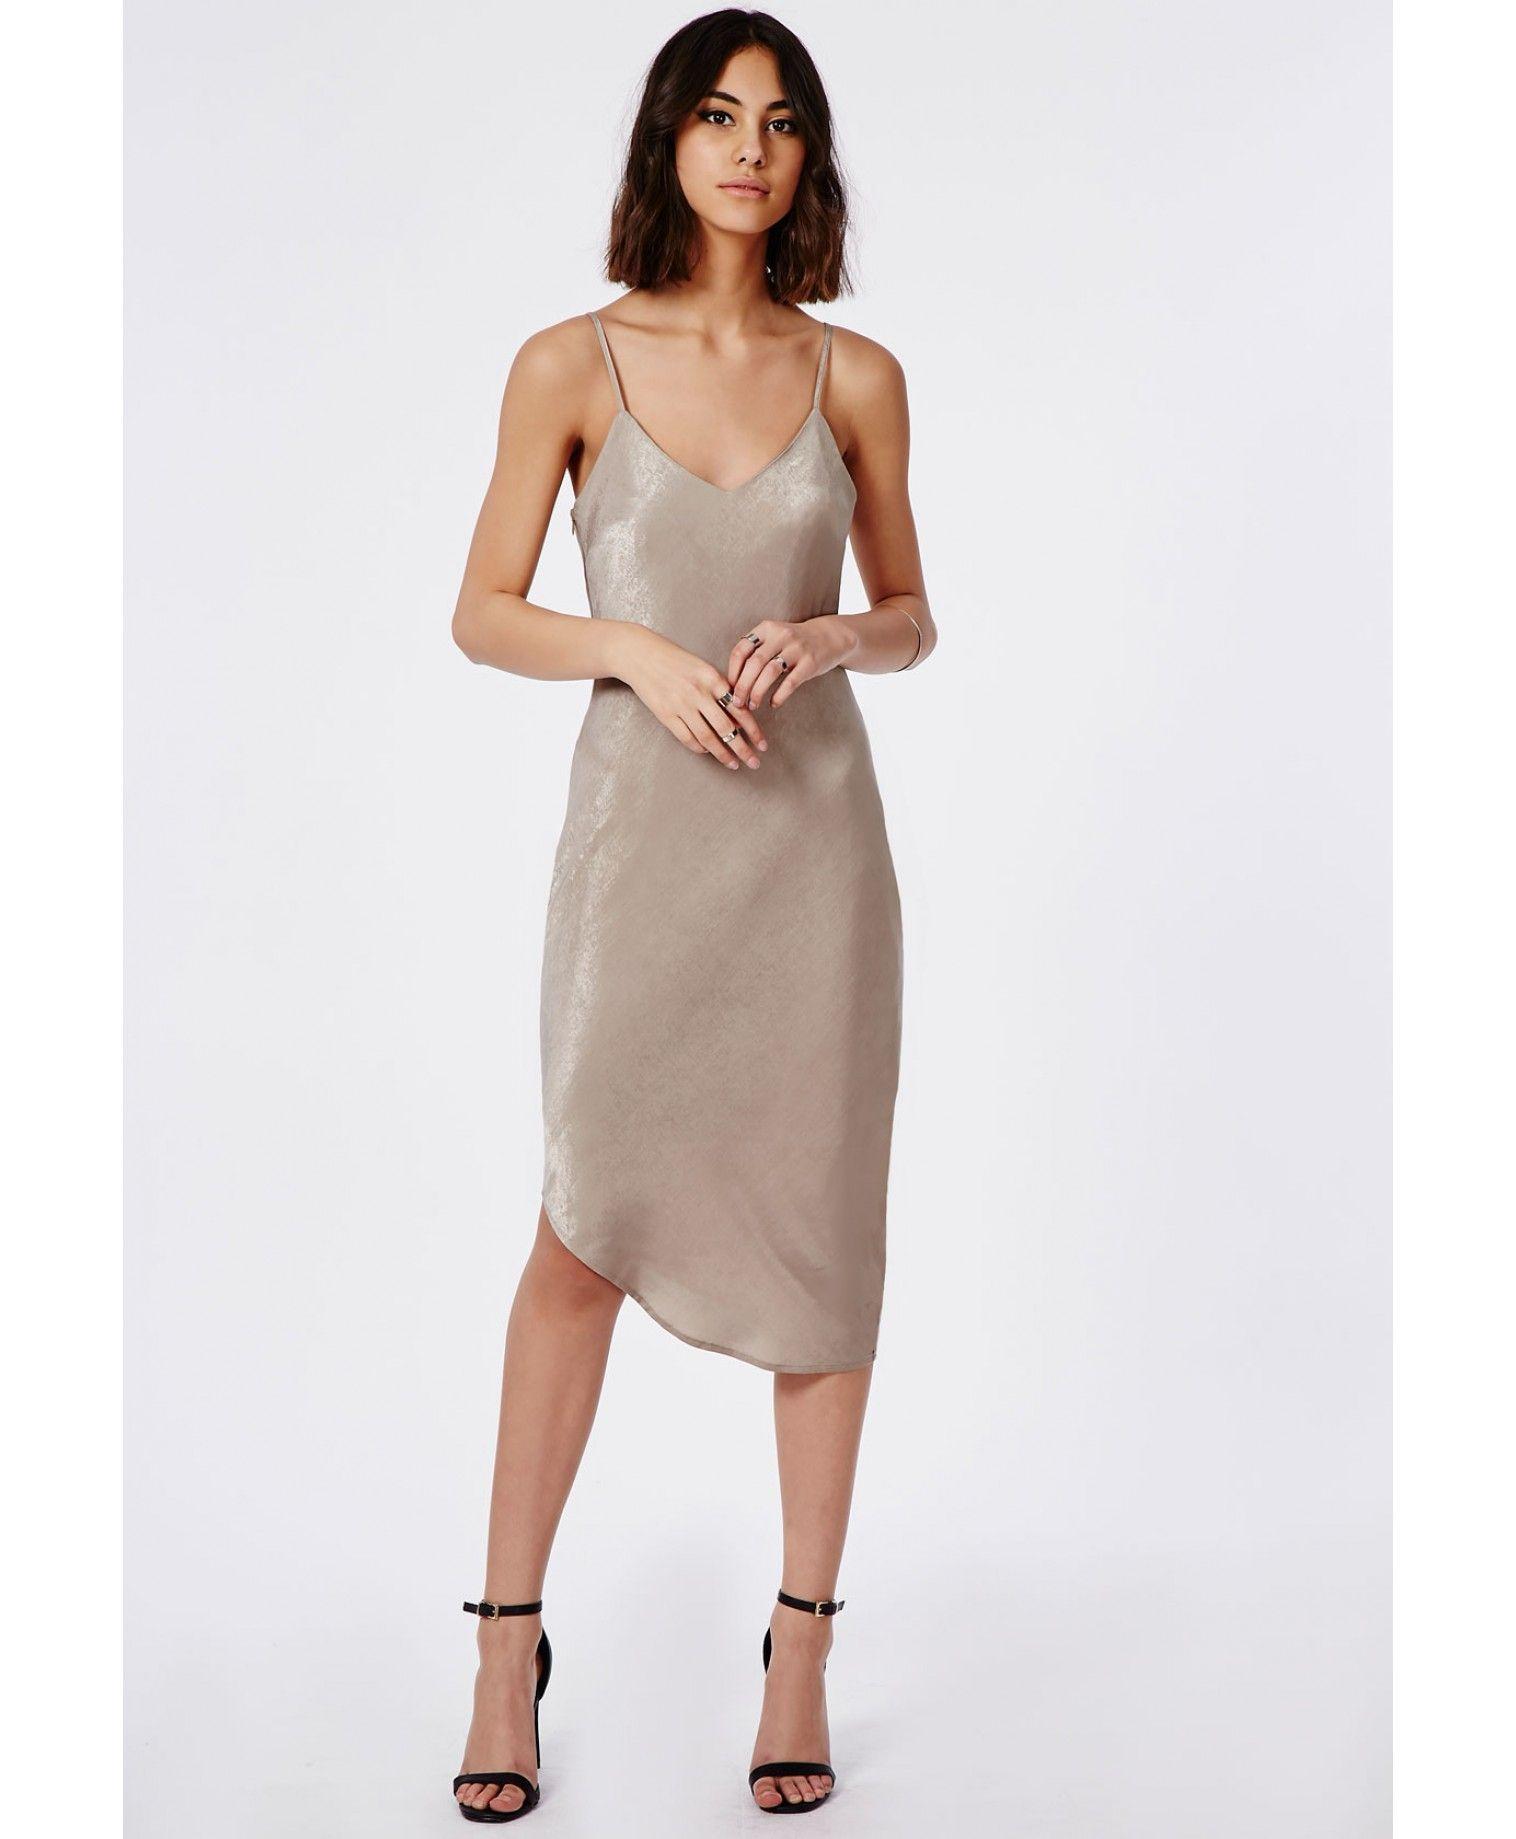 Silky Asymmetric Slip Dress Taupe - Dresses - Cami Dresses - Missguided